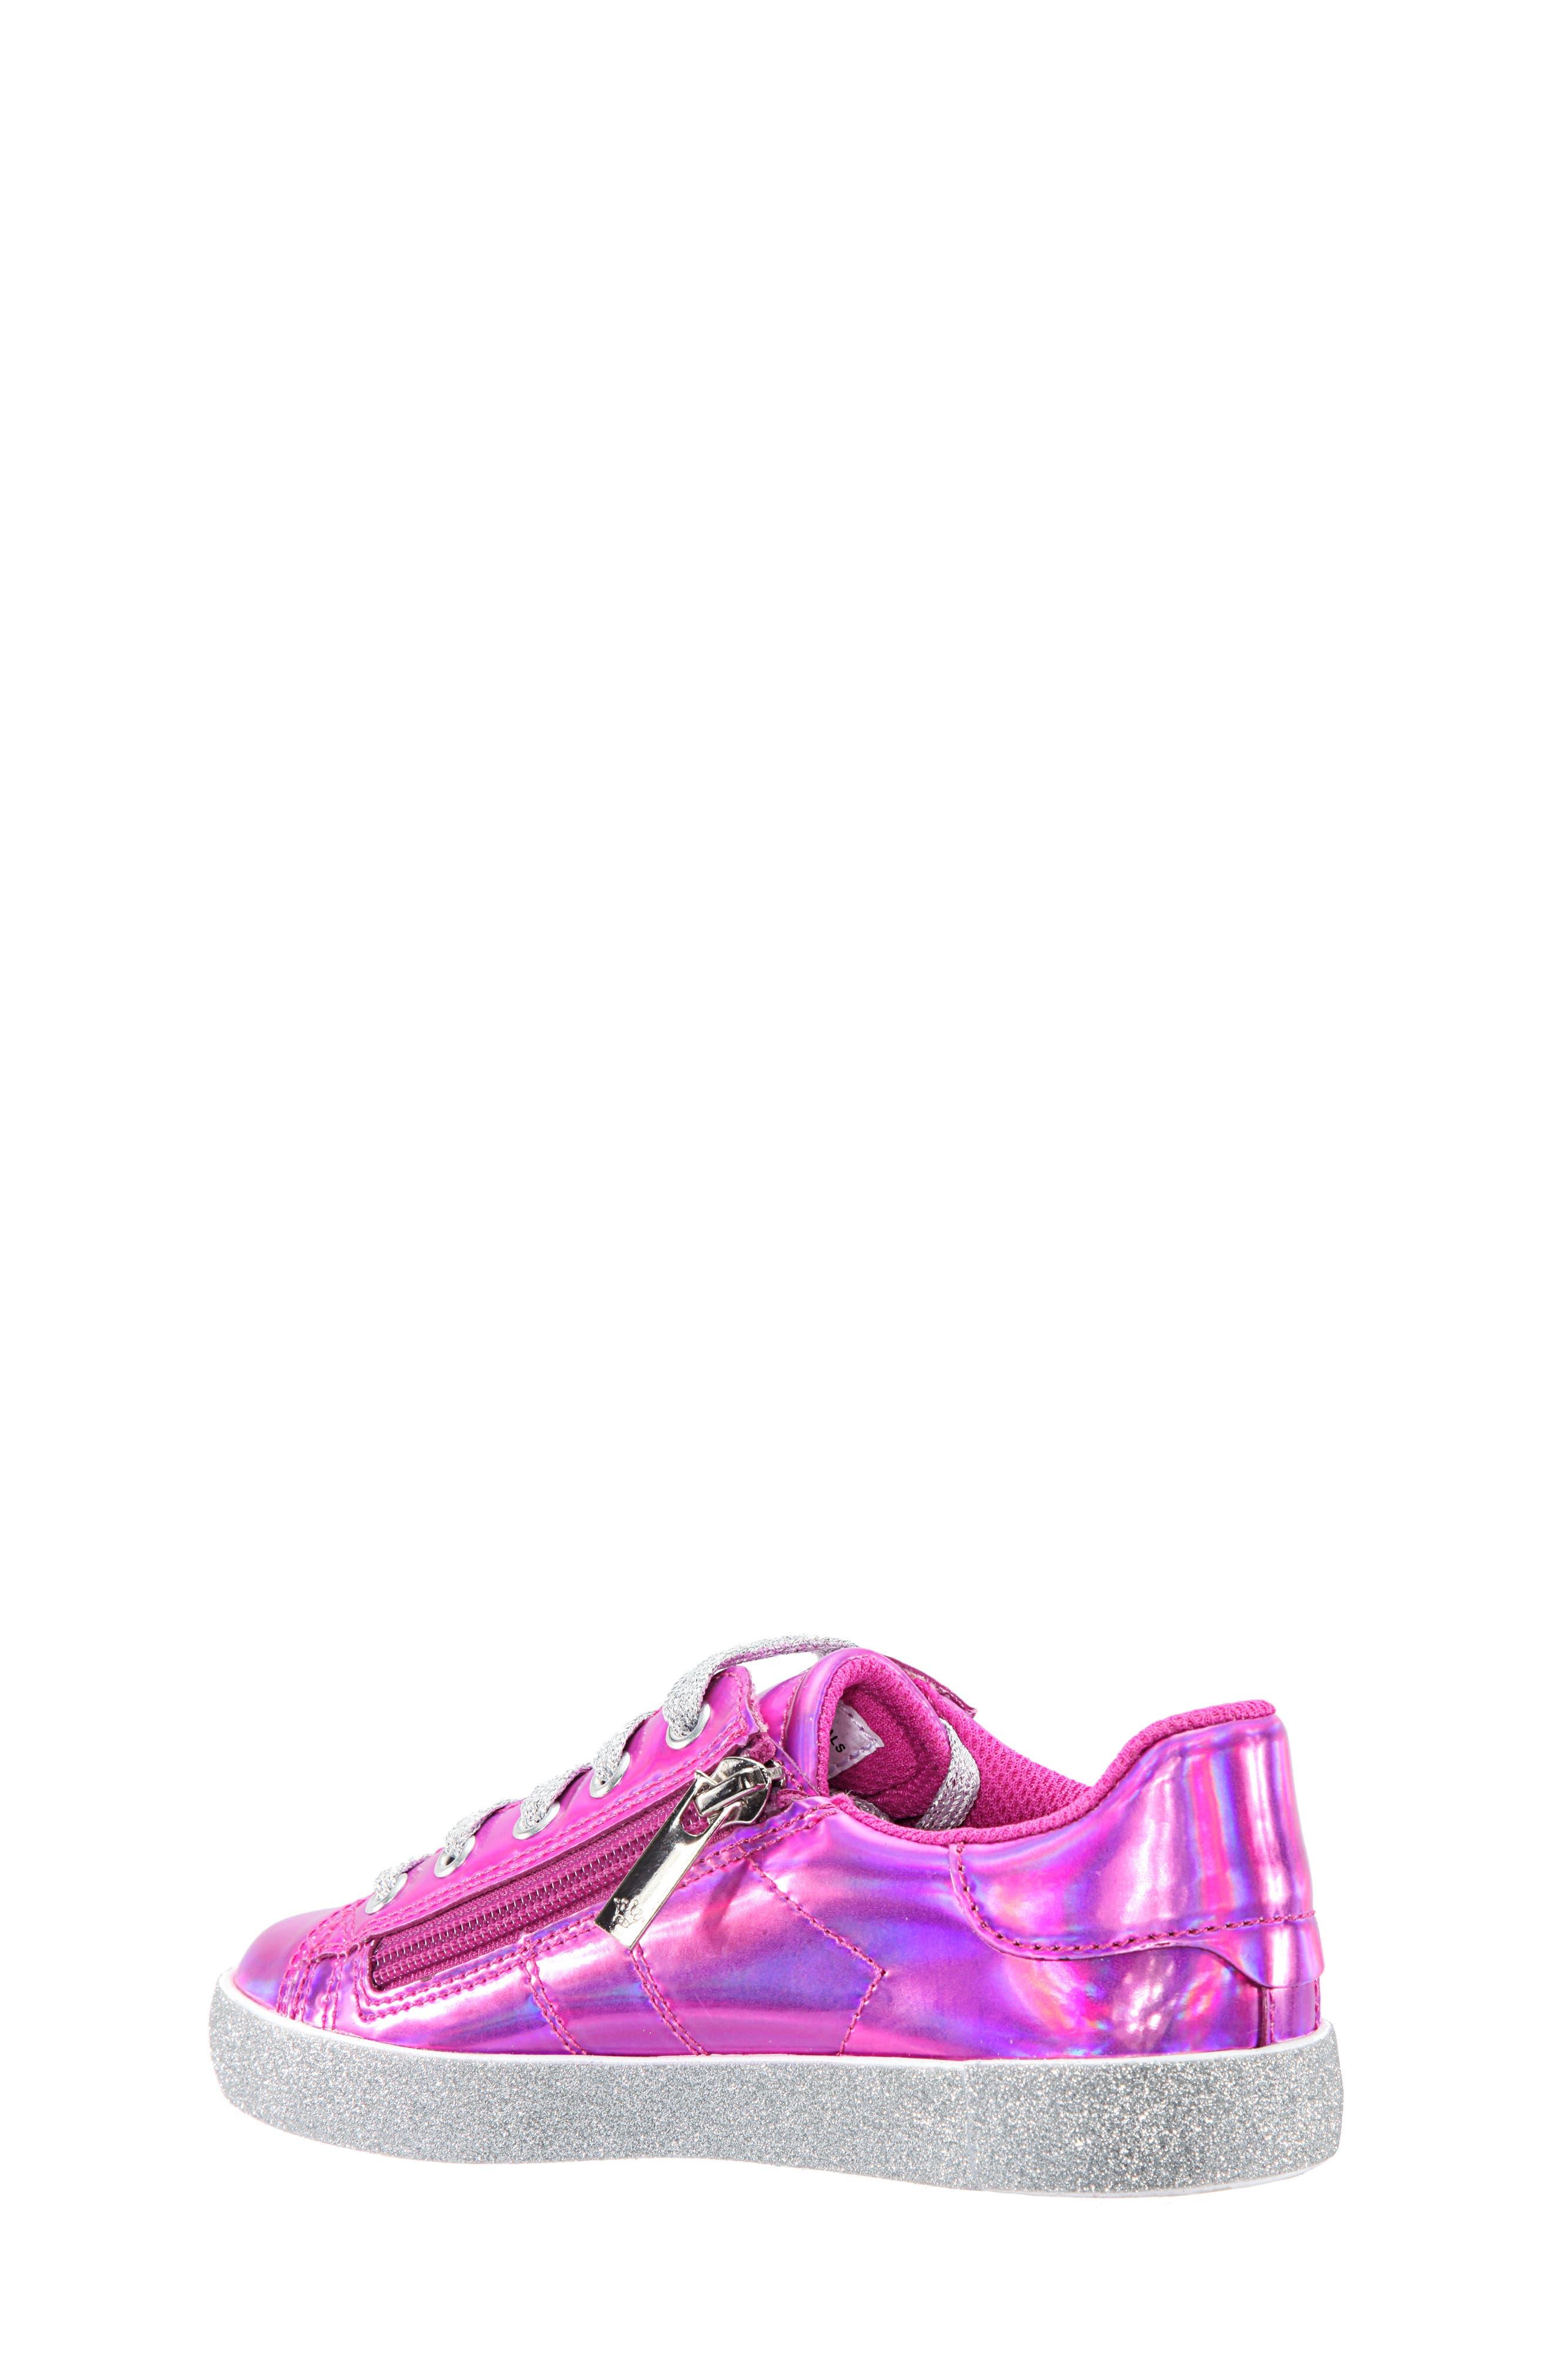 Jovana Glitter Low-Top Sneaker,                             Alternate thumbnail 2, color,                             Pink Patent